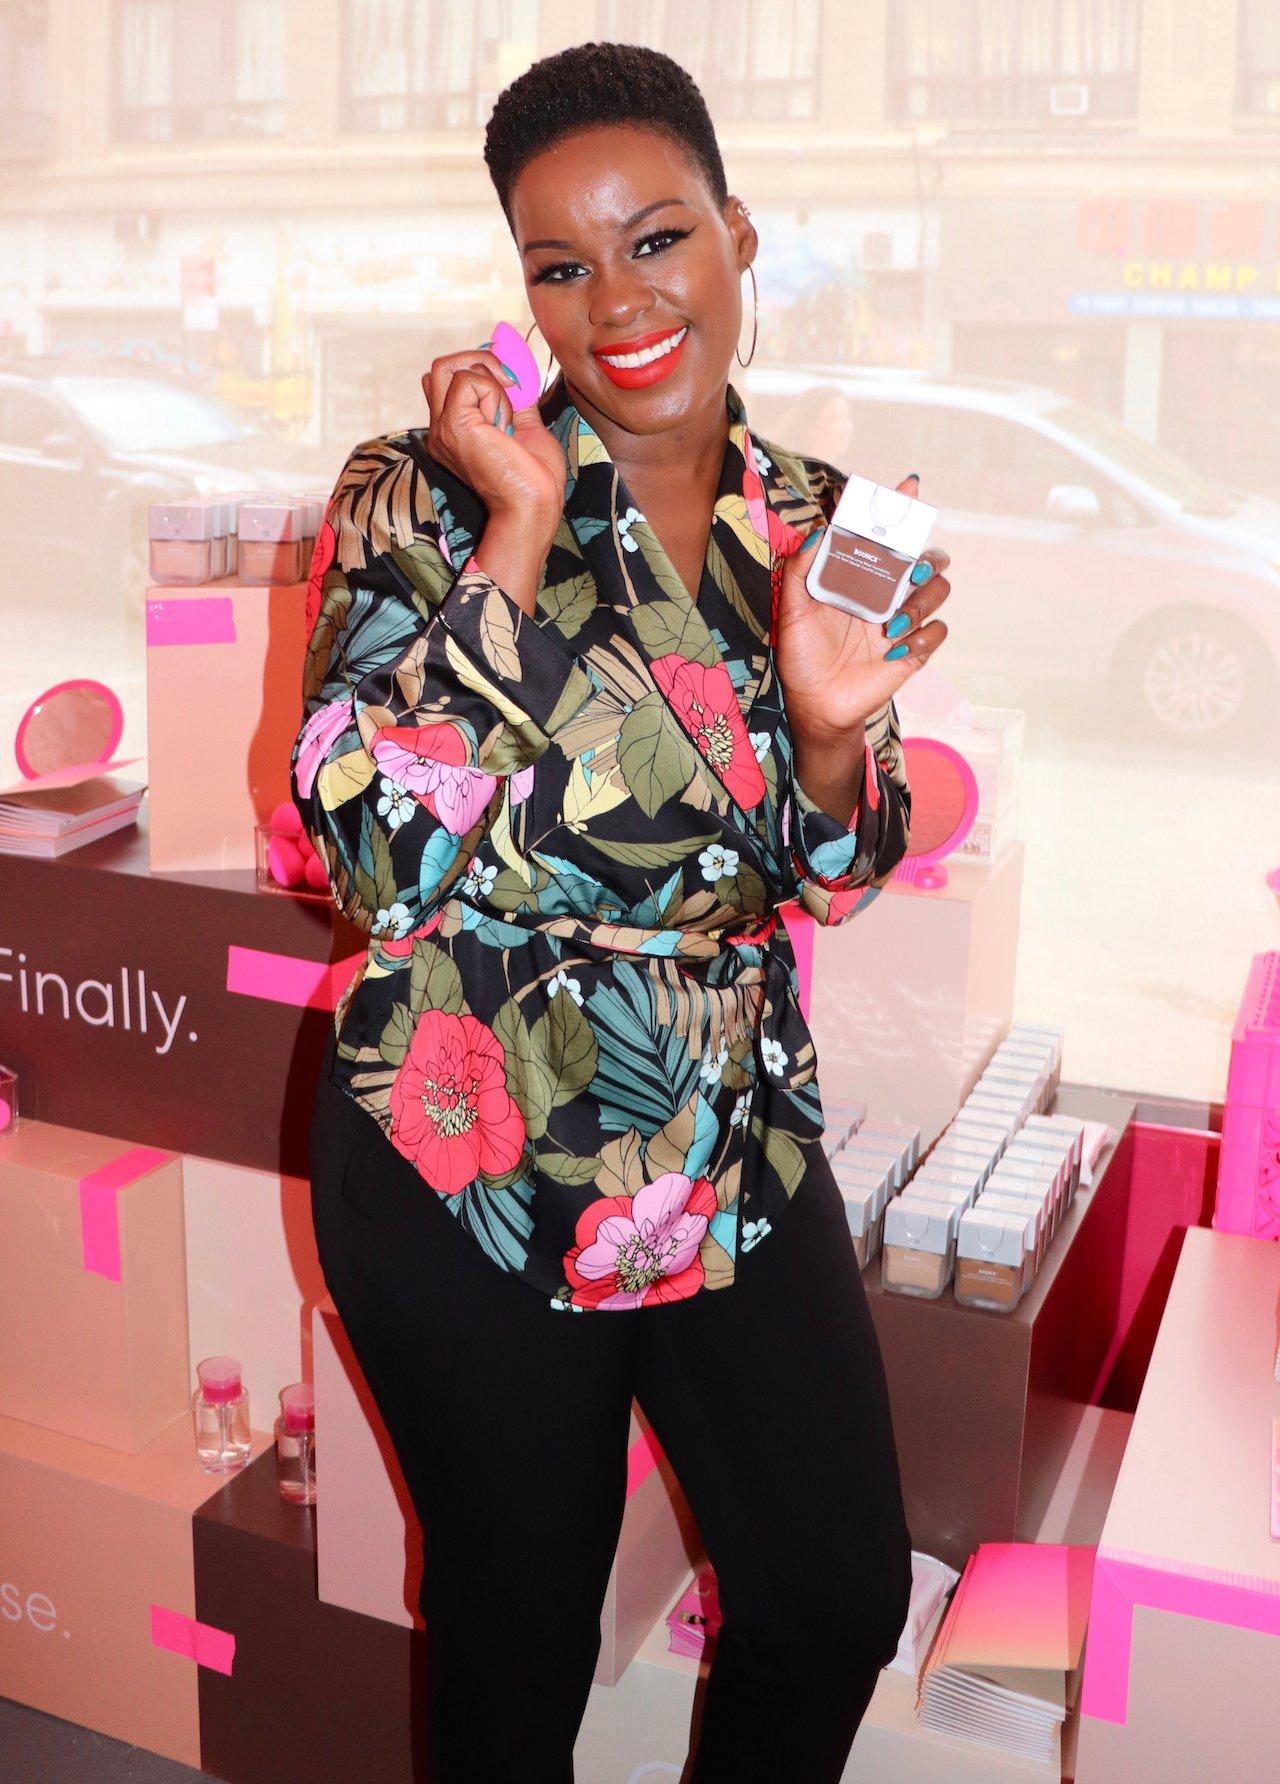 beautyblender bounce foundation bodega pop up shop